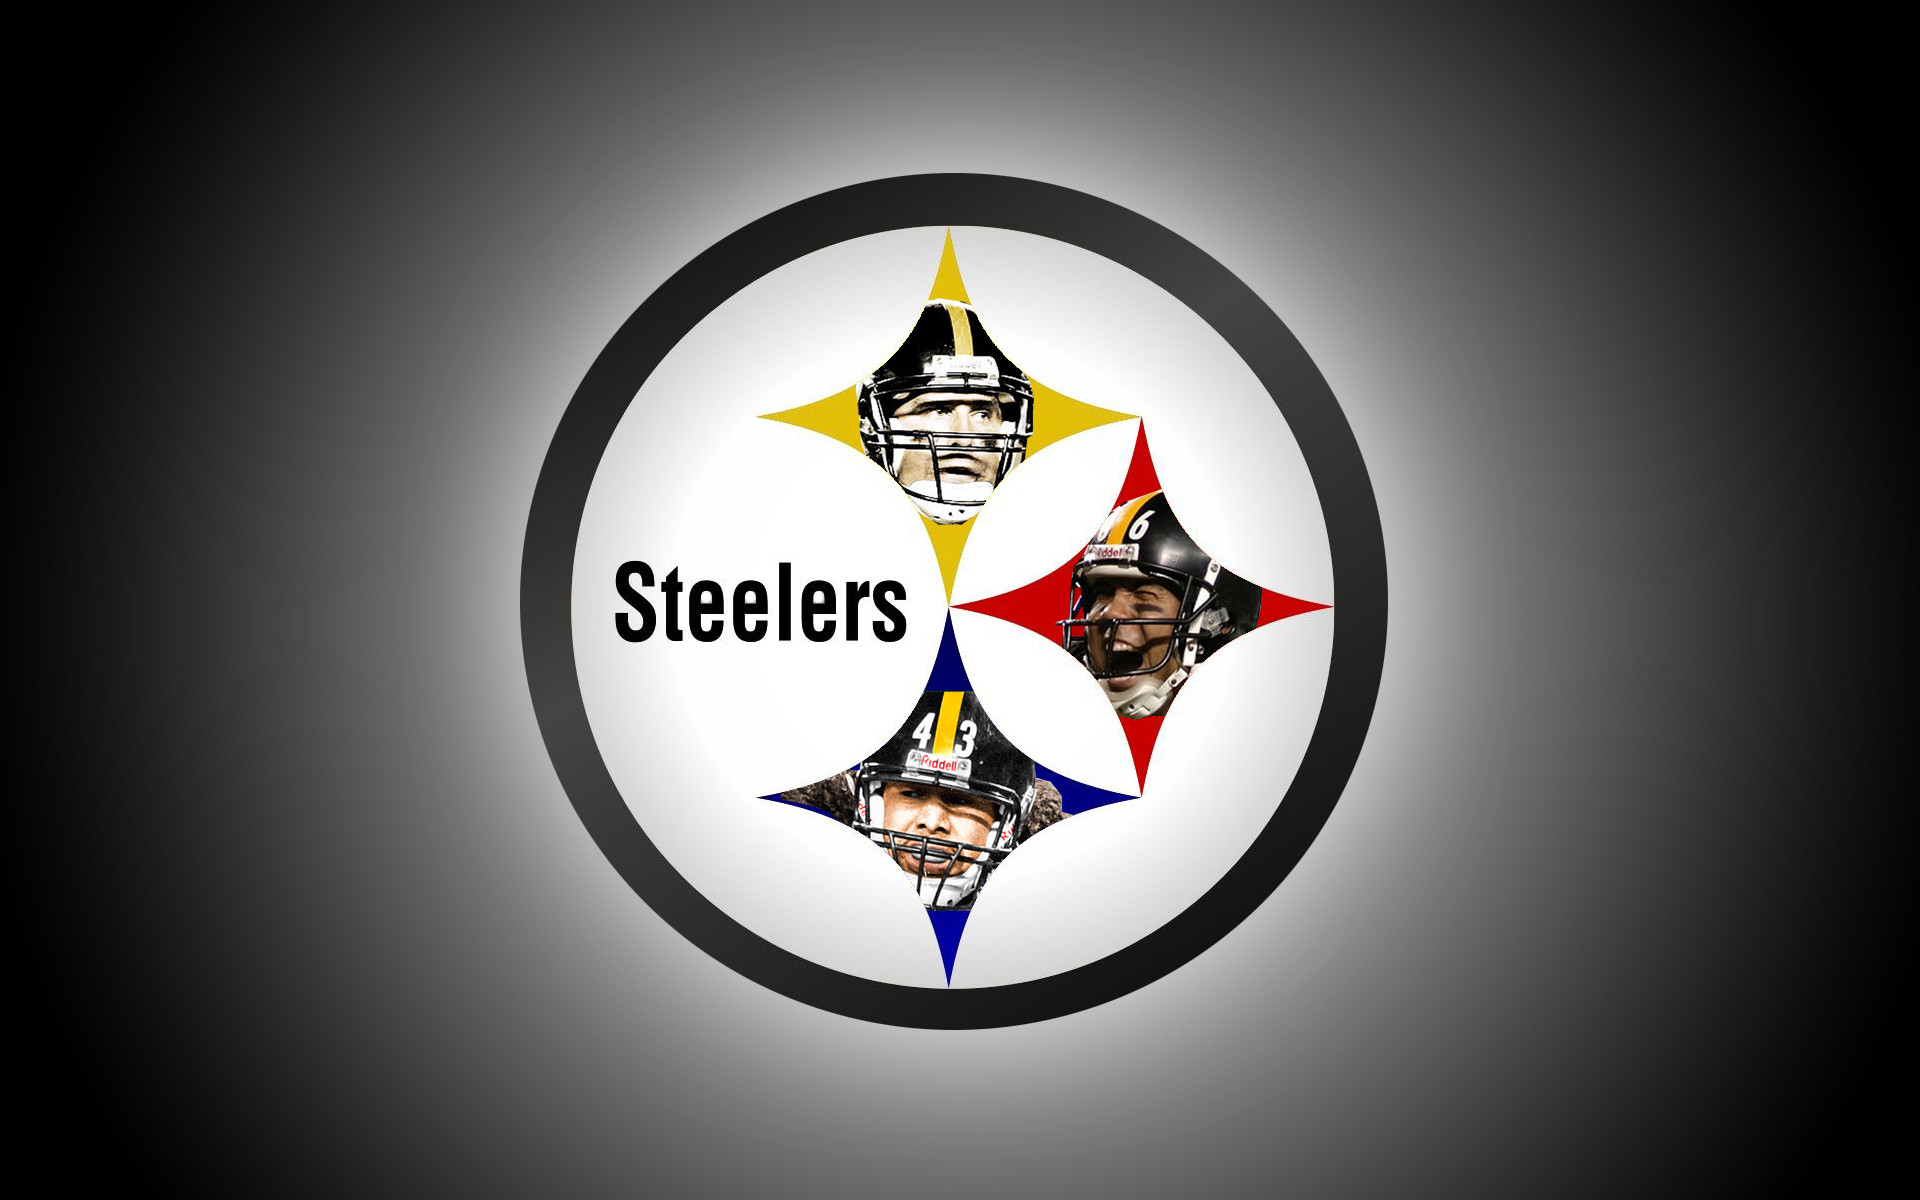 Antonio Brown Helmet >> 1920x1080 Pittsburgh Steelers Desktop Wallpaper (71+ images)